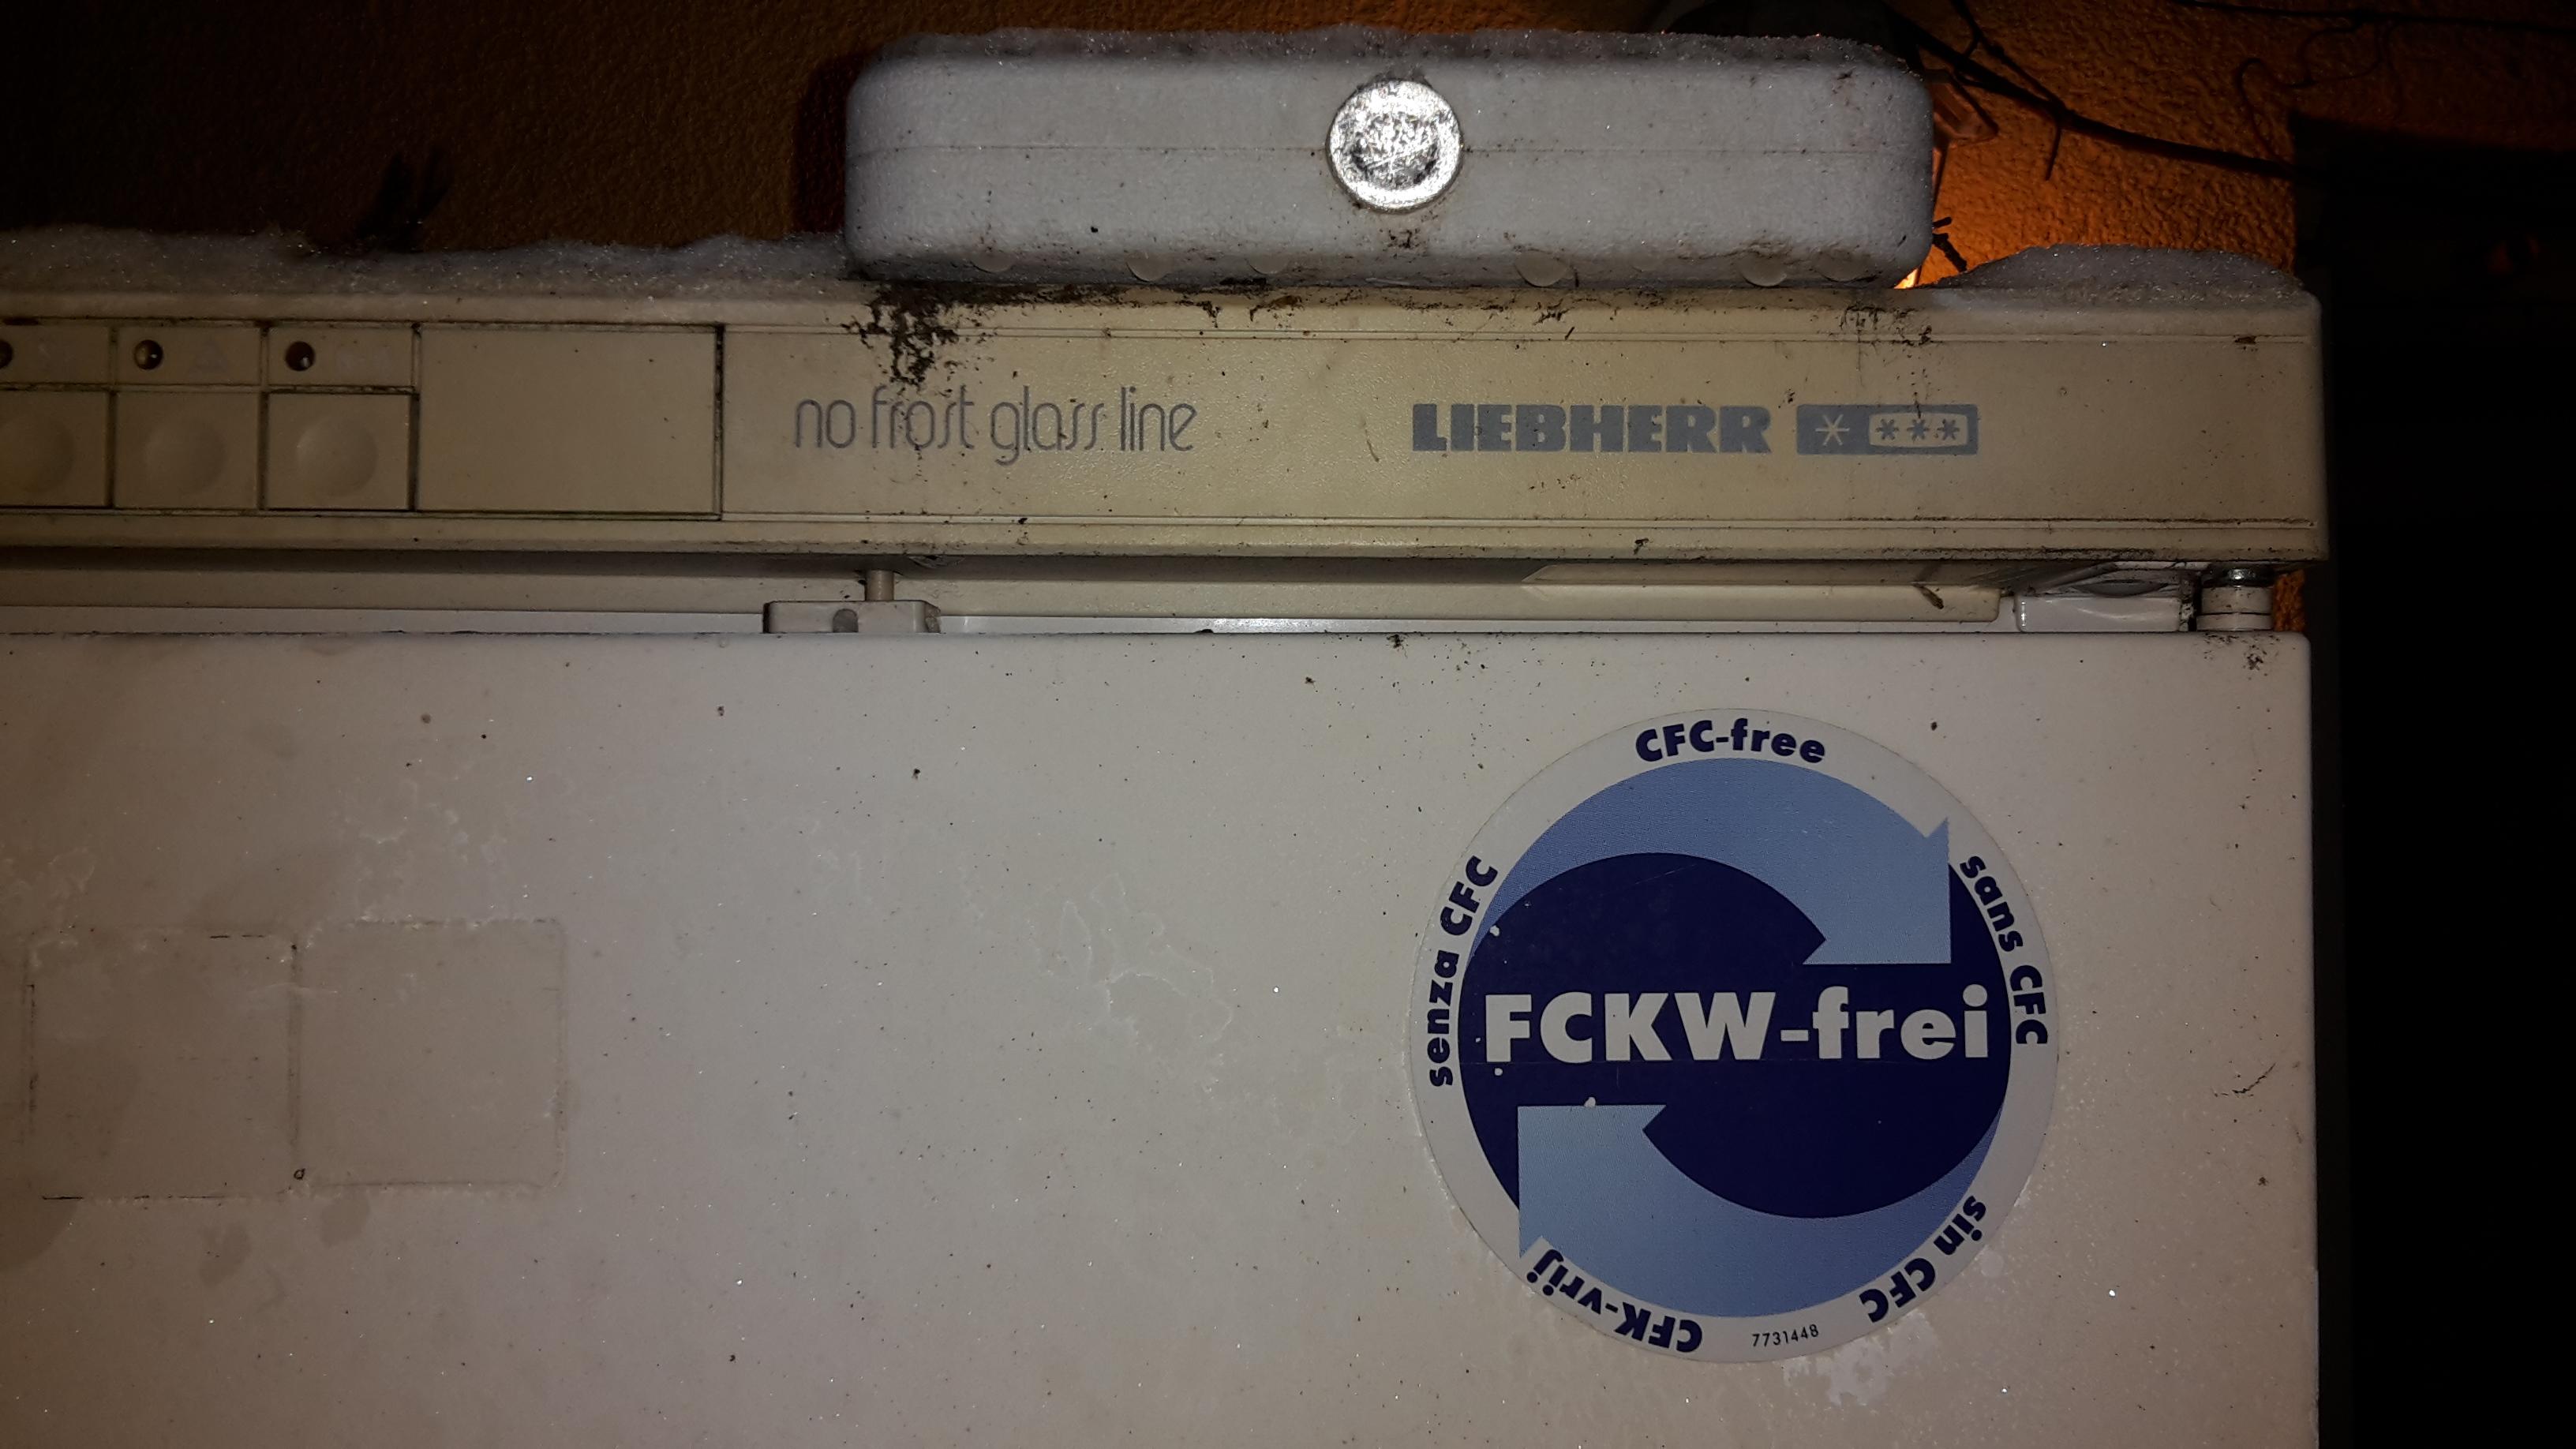 Siemens kühlschrank piepst neff geschirrspüler rotes licht blinkt